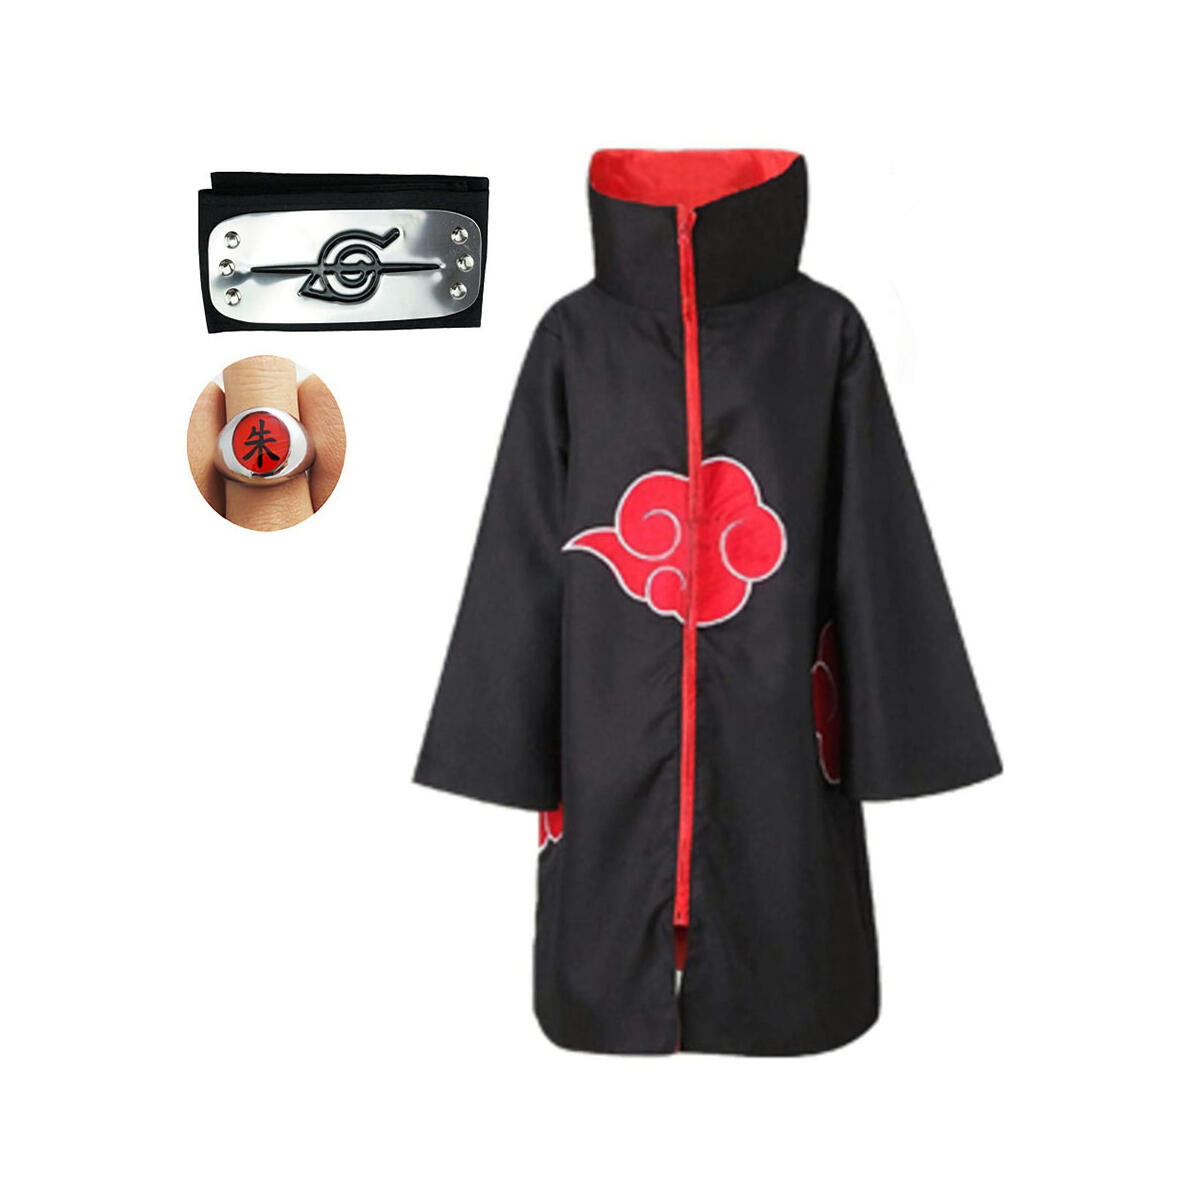 Akatsuki Cloak Costume 3Pcs with Headband and Ring, Itachi Cosplay Costume